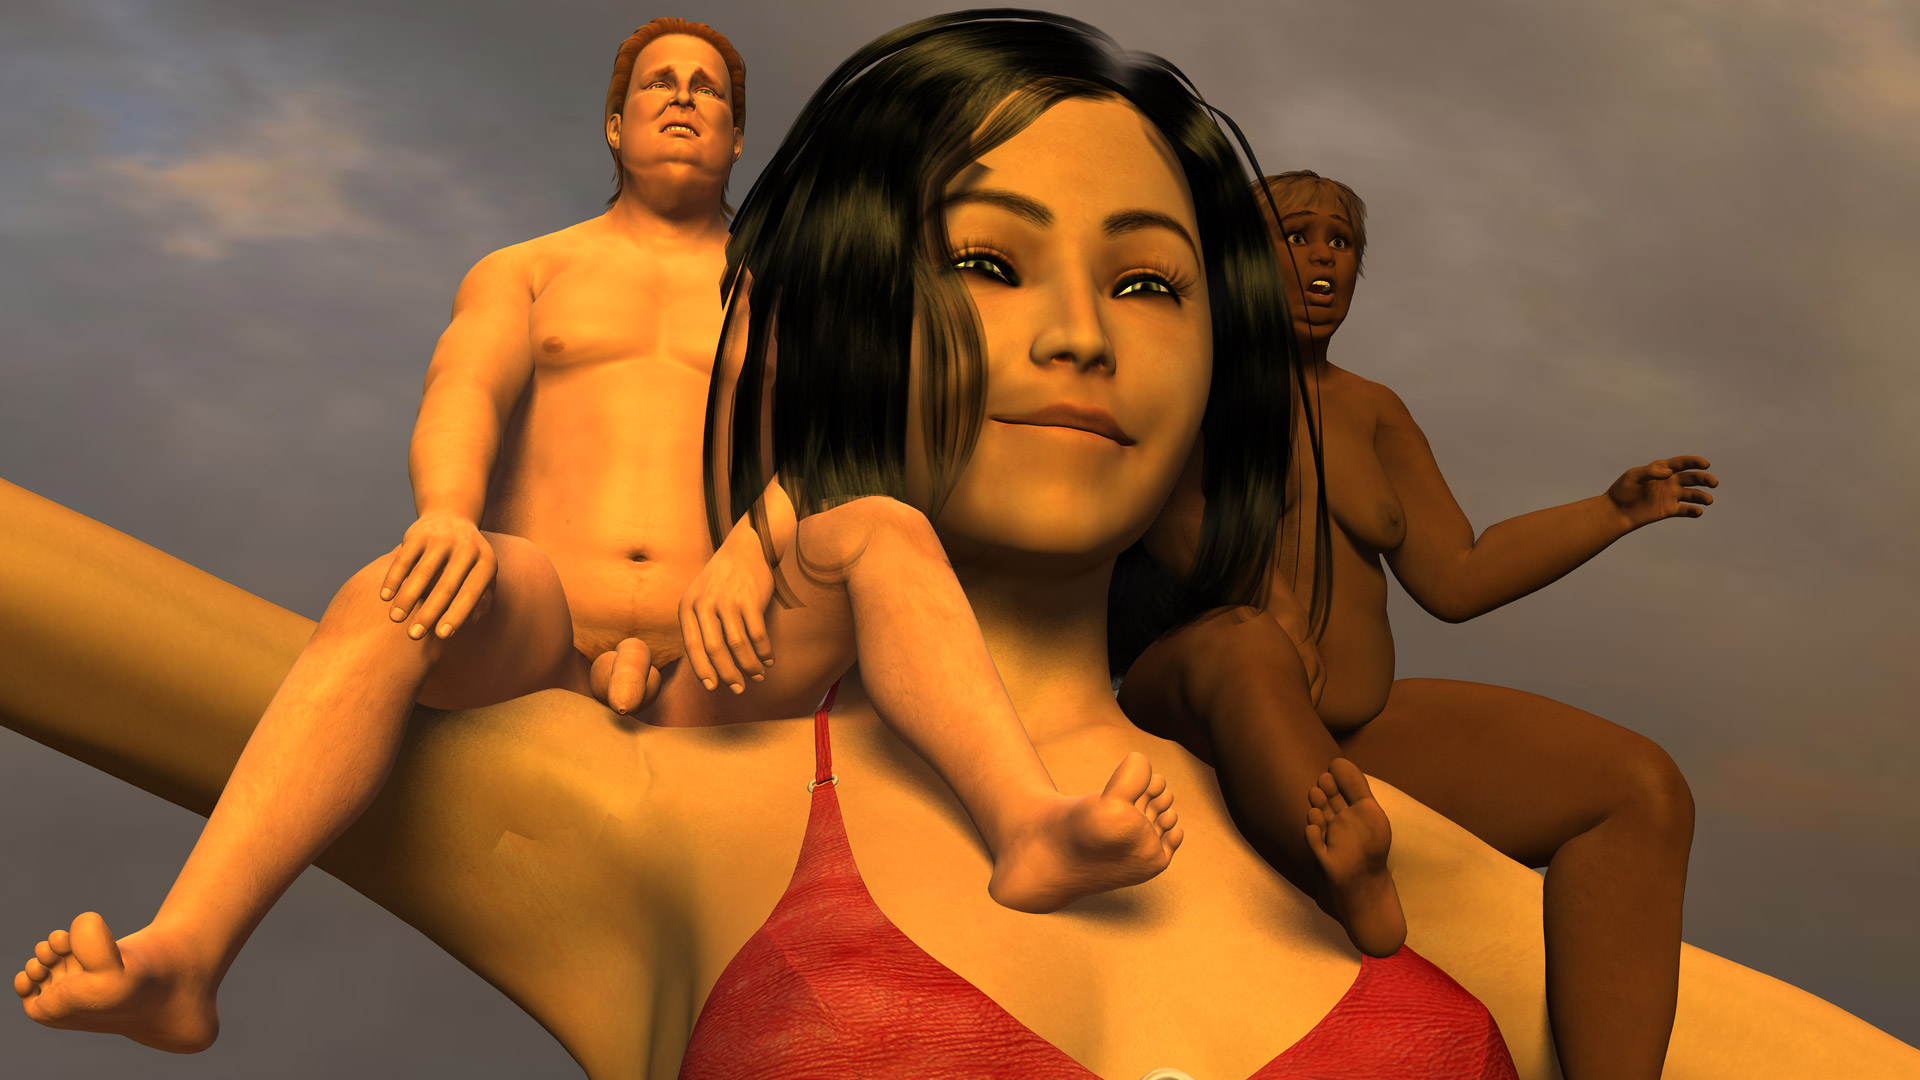 Shrunken Man Men Small Vore Nude Poser Filmvz Portal